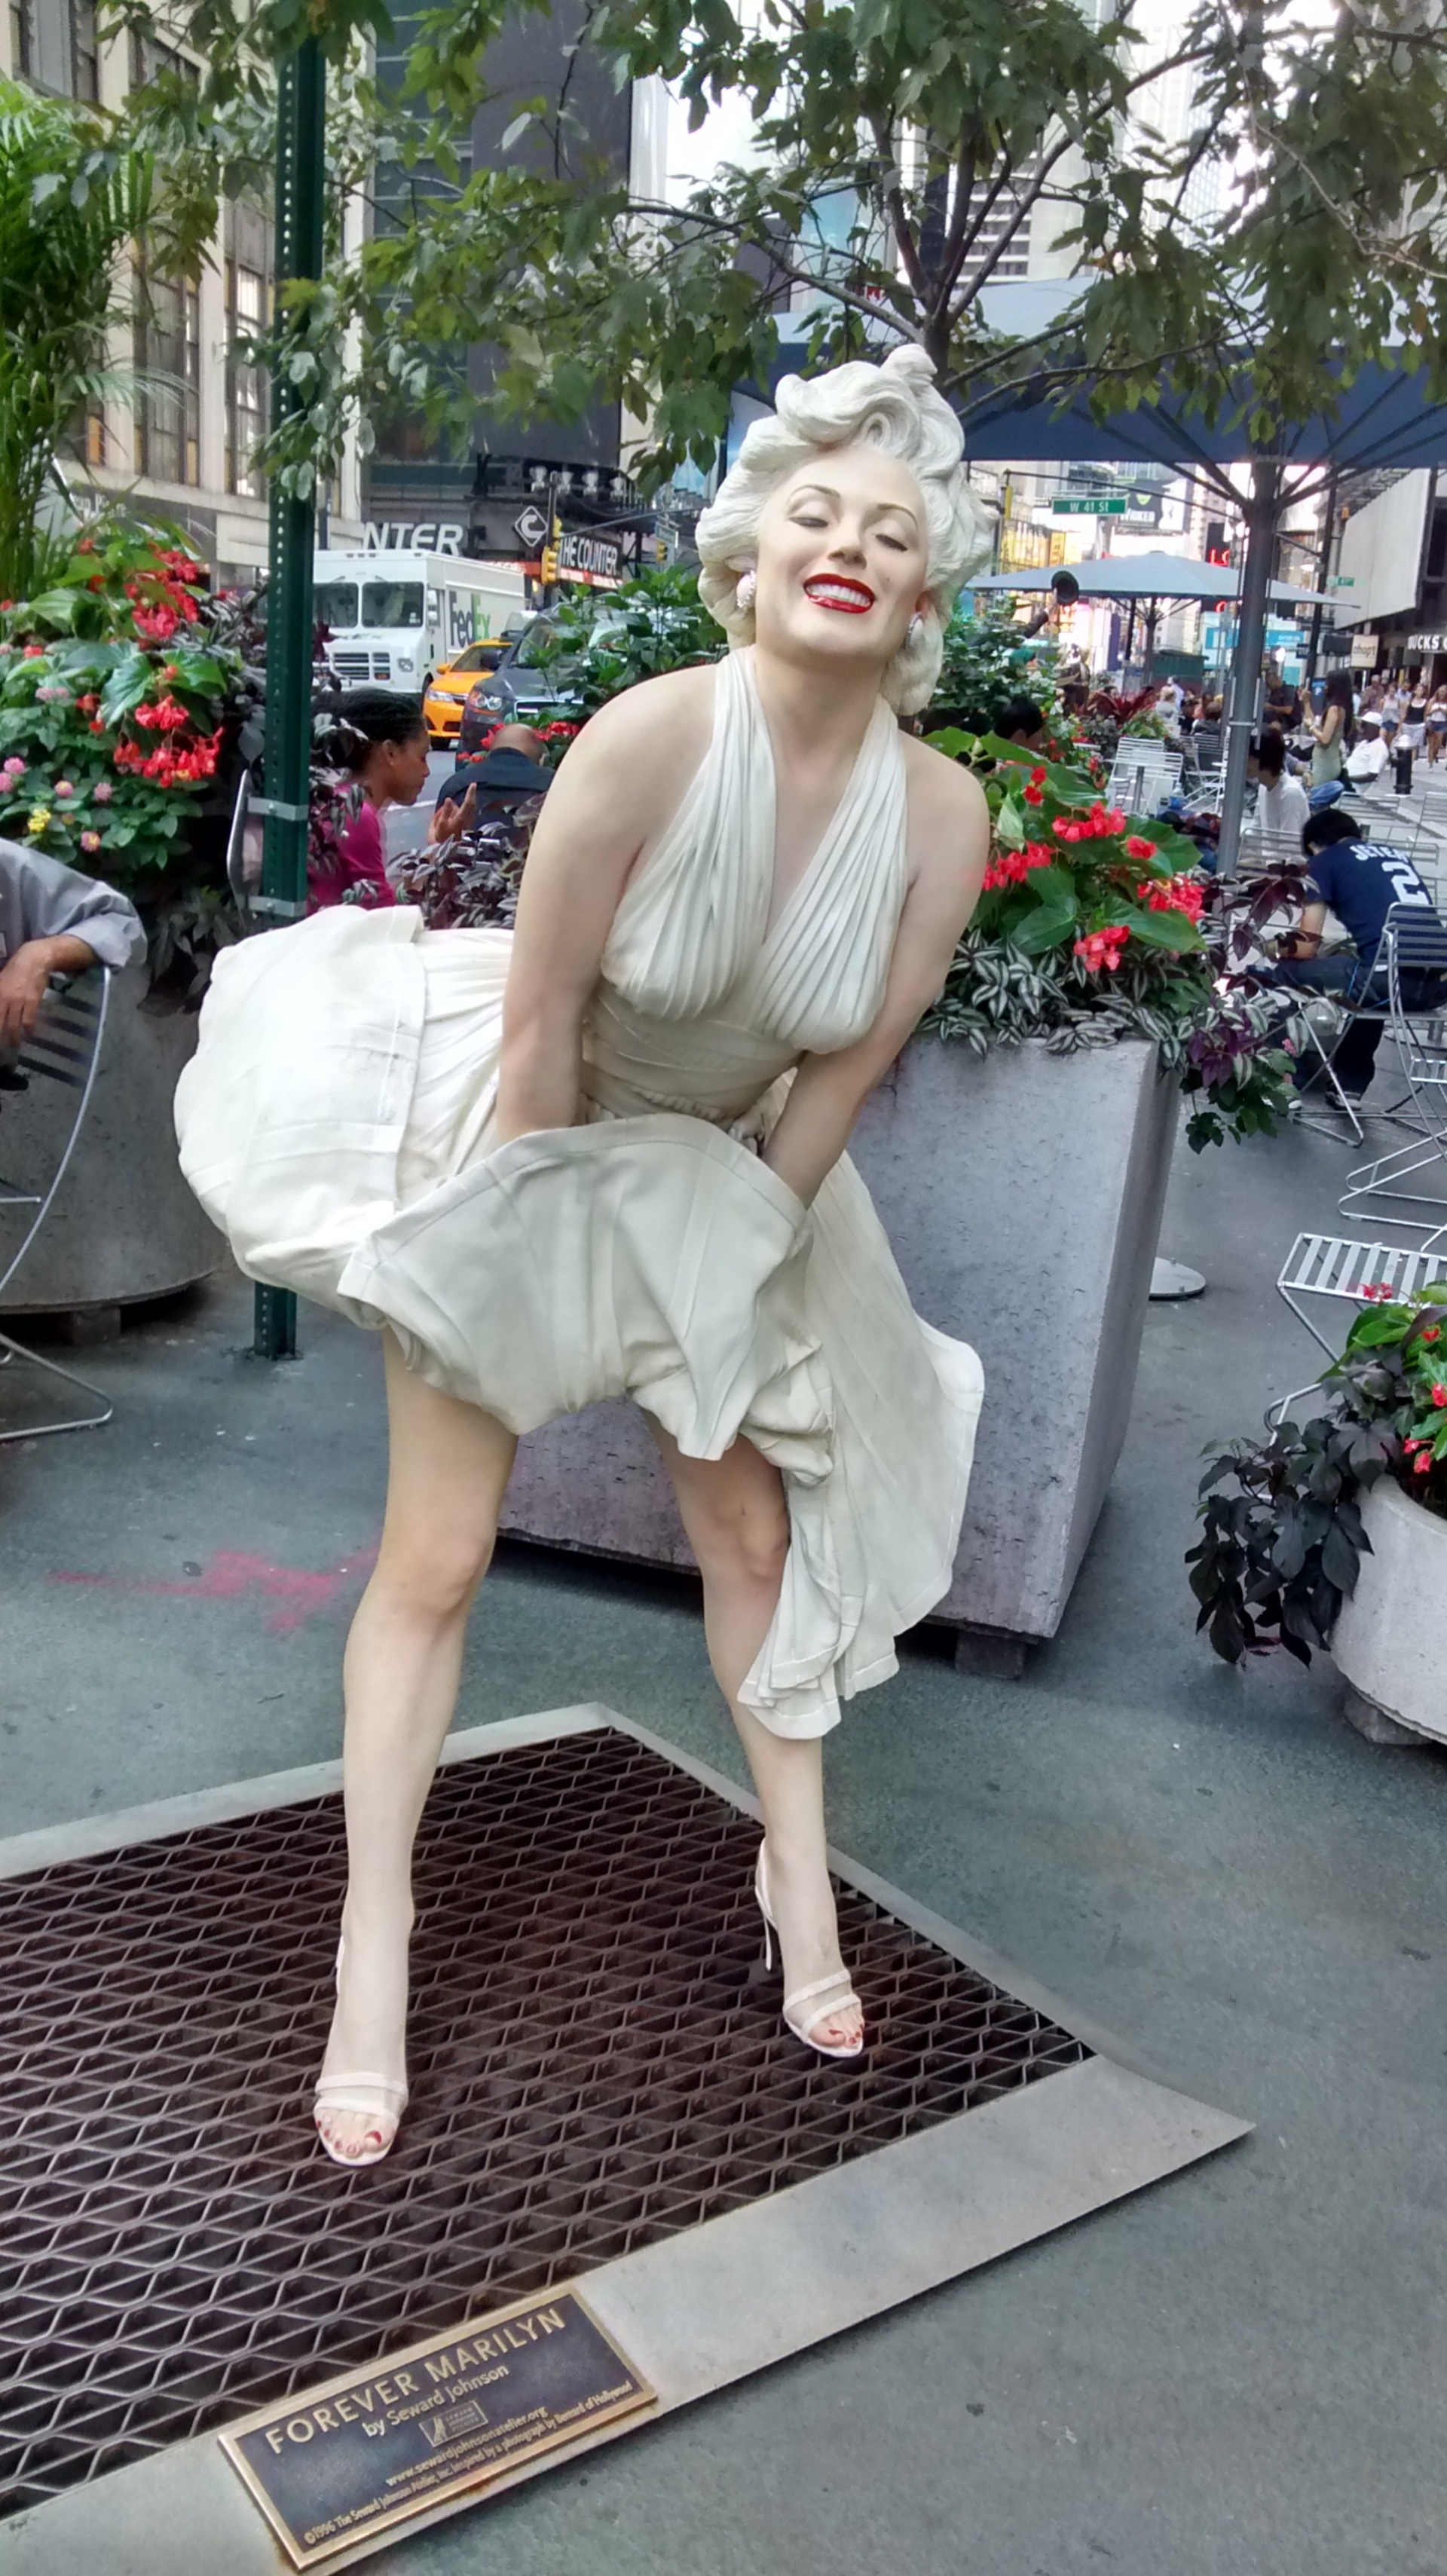 Artwork of Marilyn Monroe. 40th street and Broadway